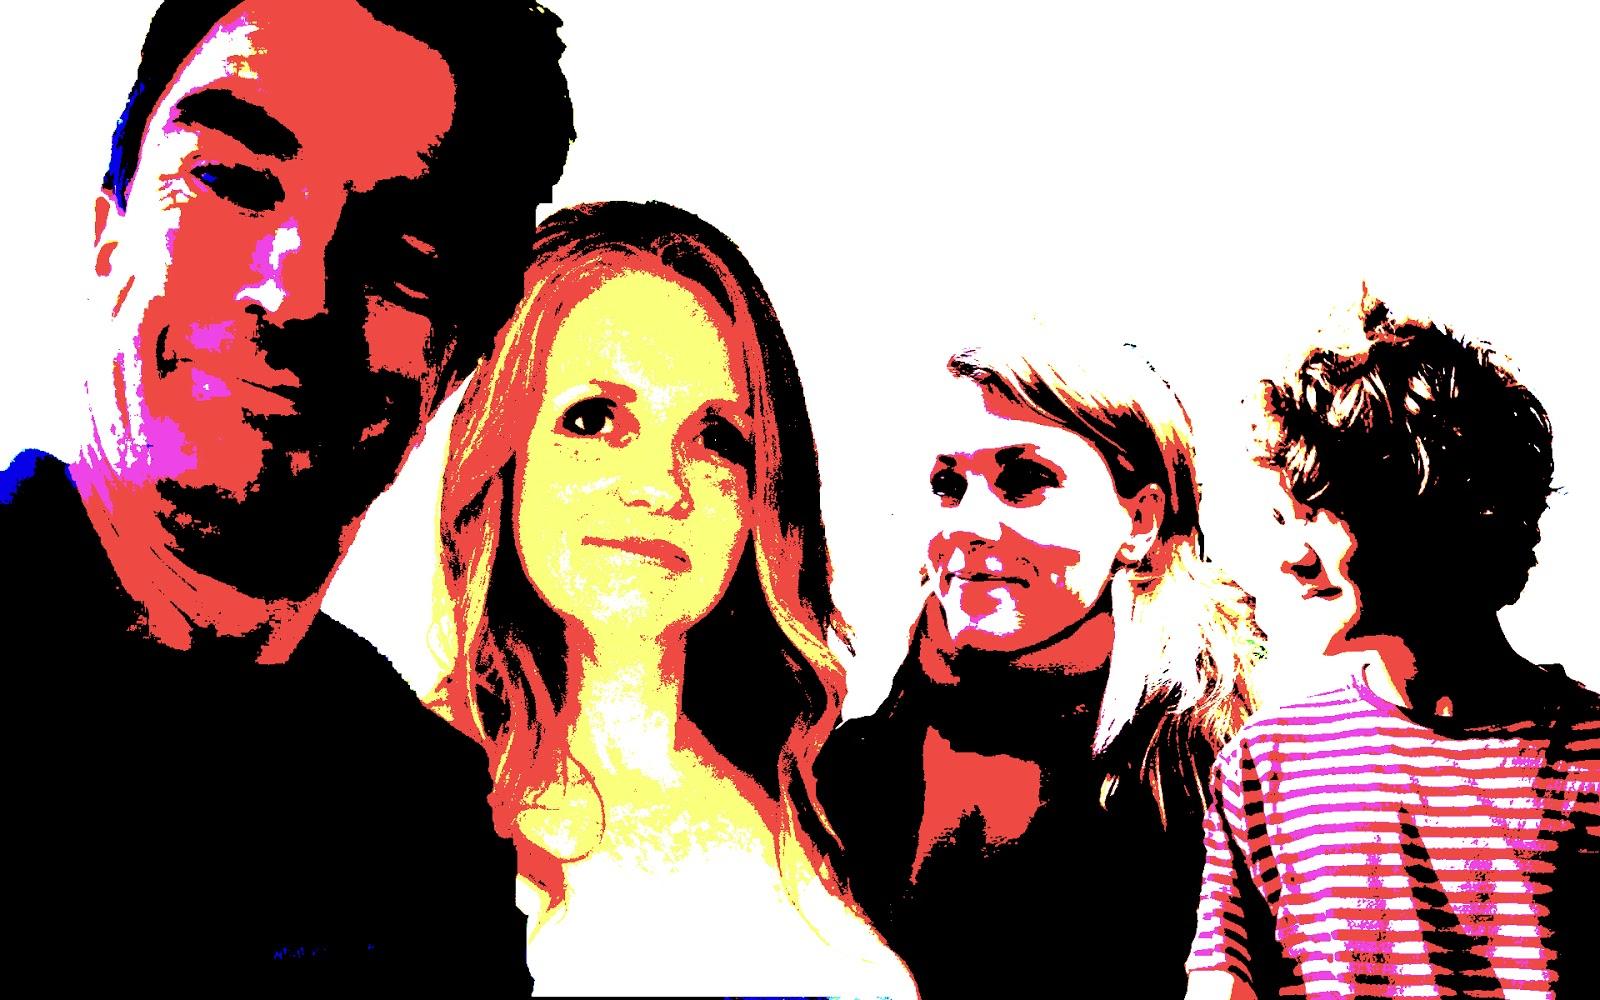 Animatedcreativeandreamcswan Andy Warhol Photoshop Effects Layers